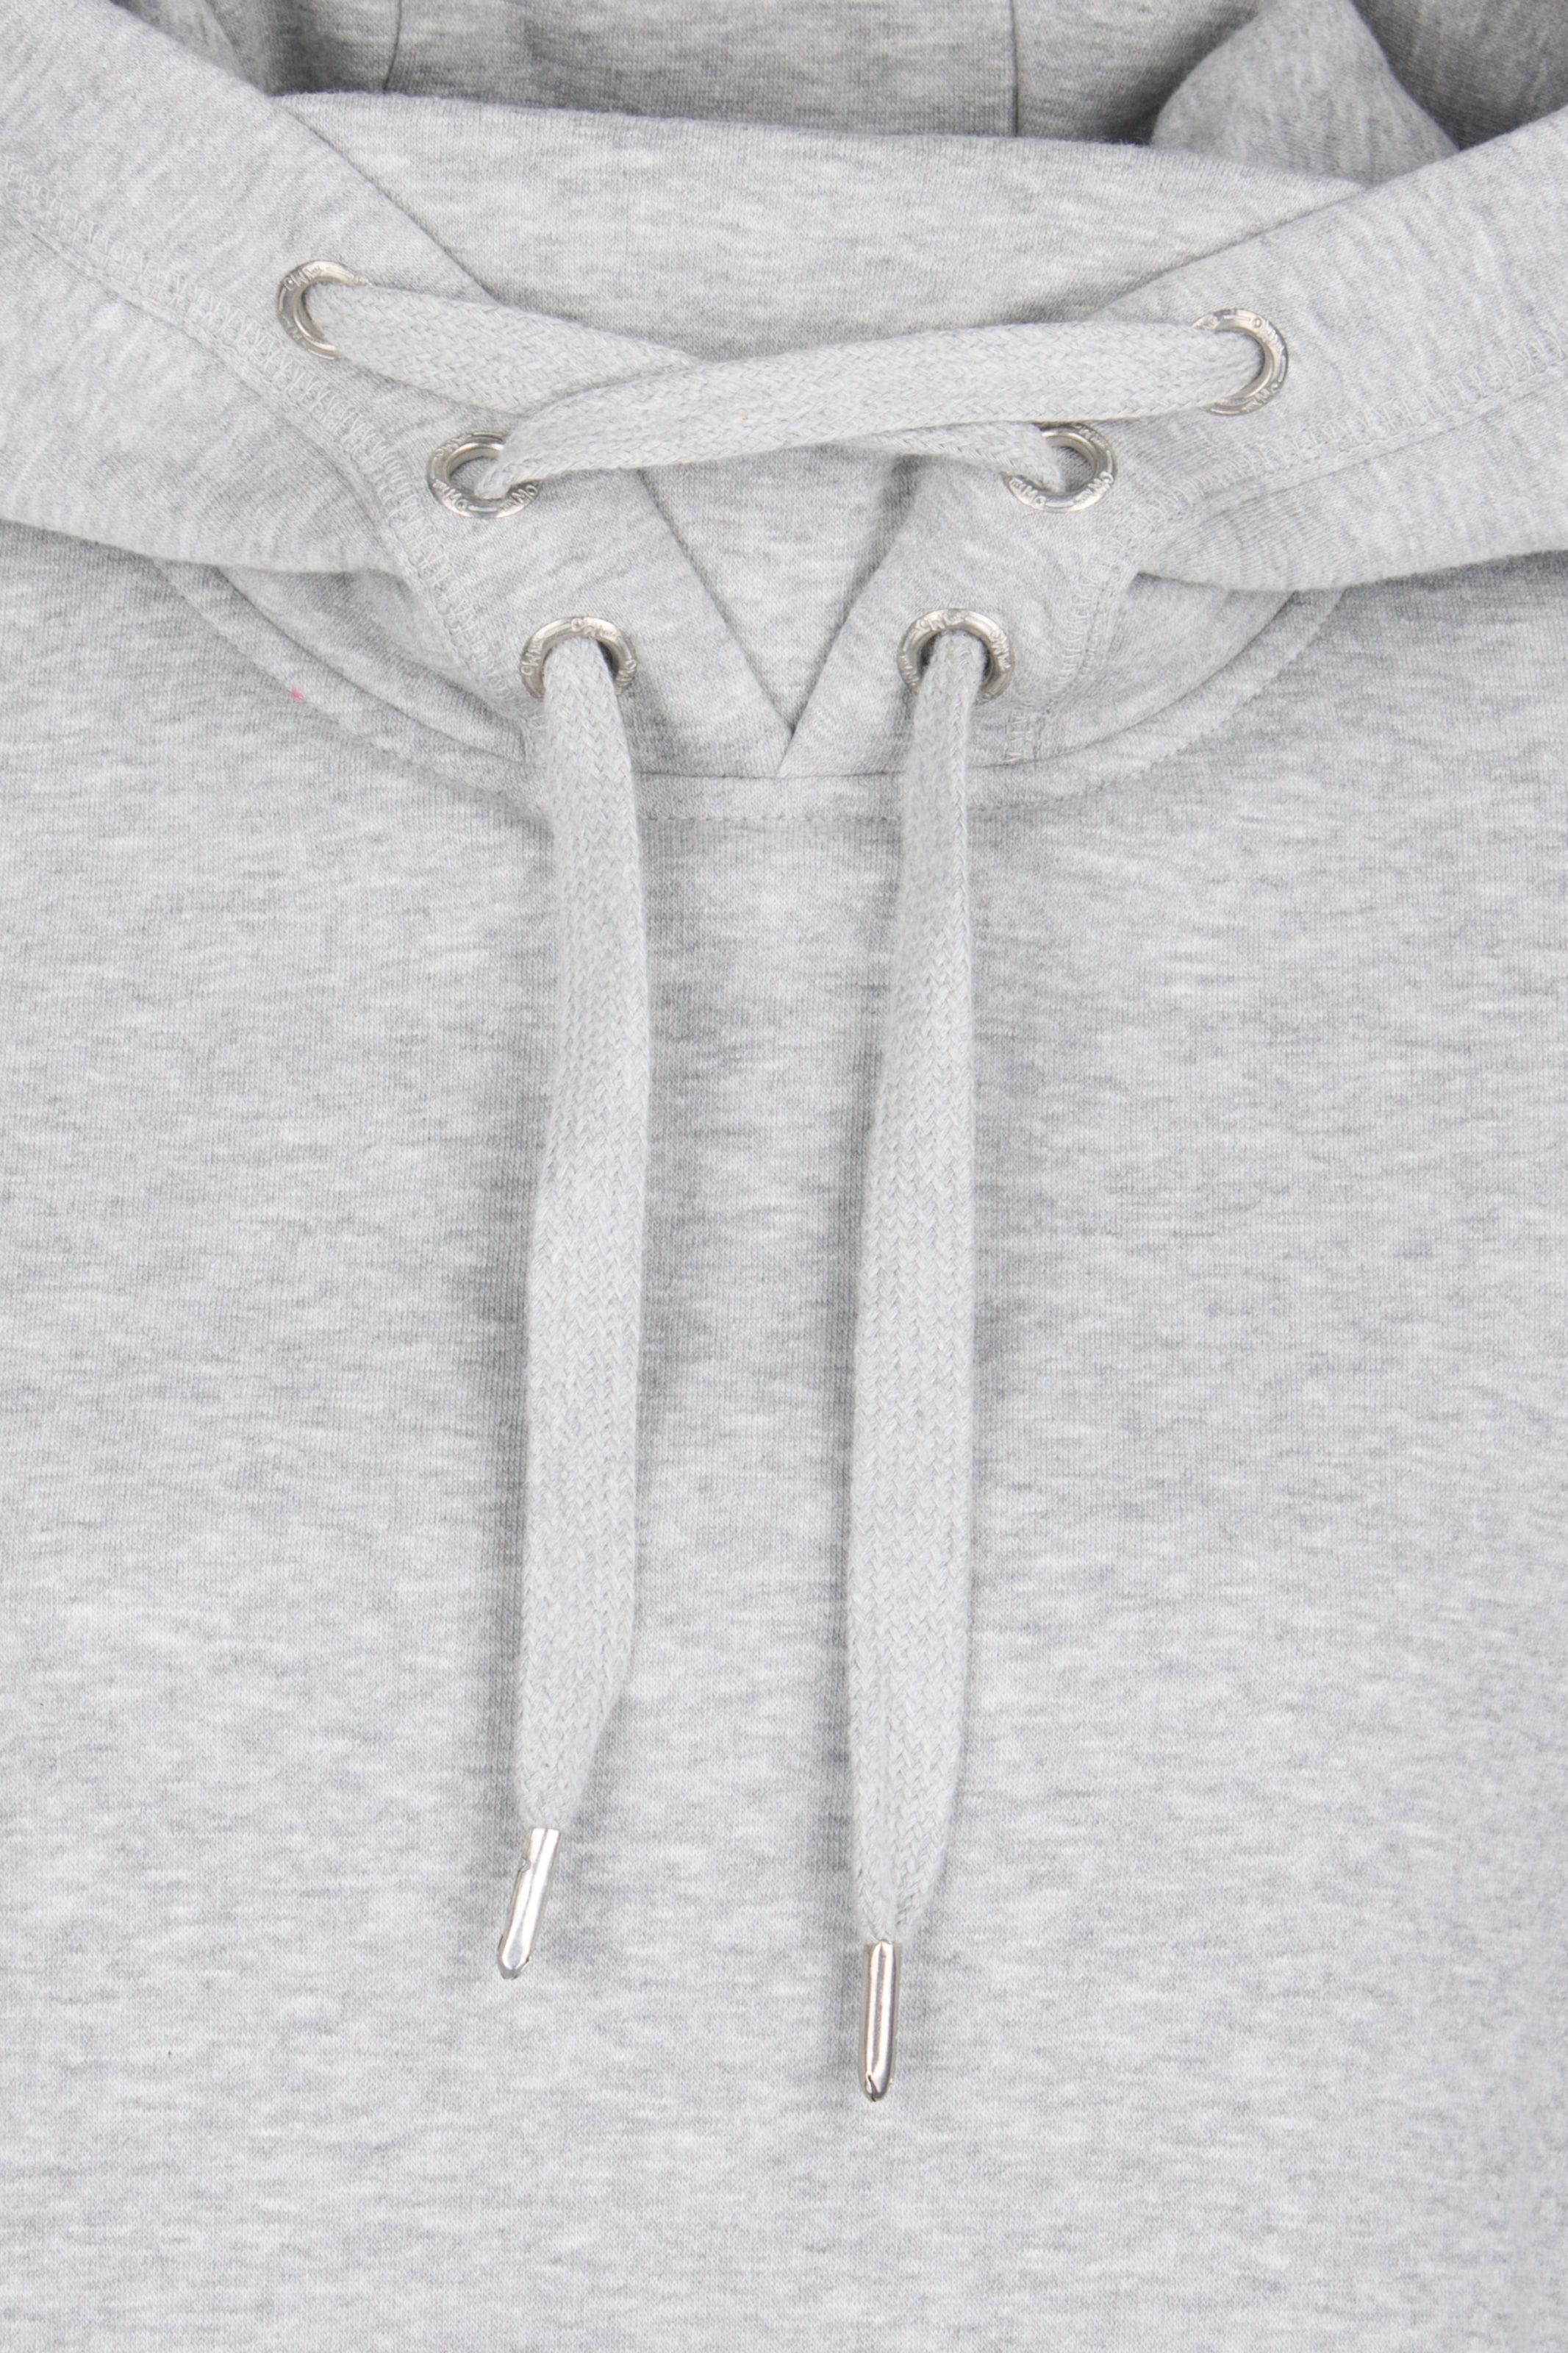 Sweat shirt Sweat Sweat shirt Mymo Gris Gris Mymo En En Mymo u3TK1lFcJ